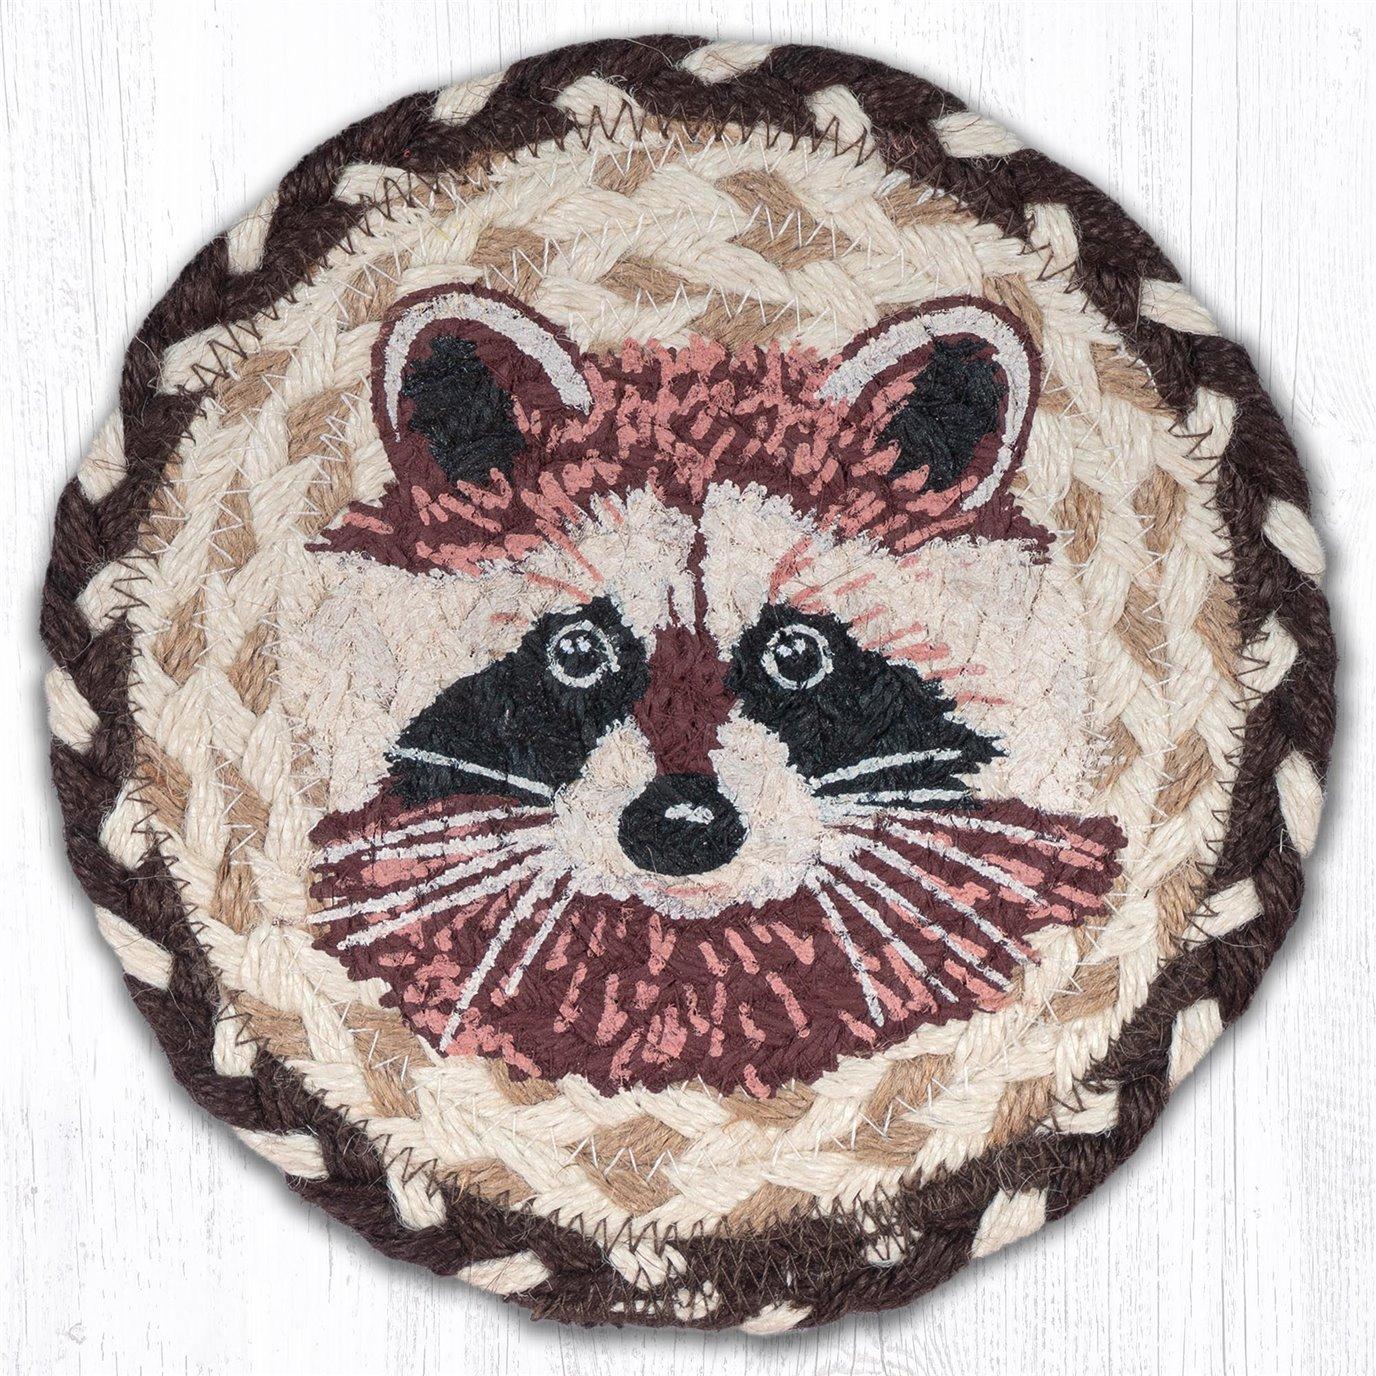 "Raccoon Round Large Braided Coaster 7""x7"" Set of 4"